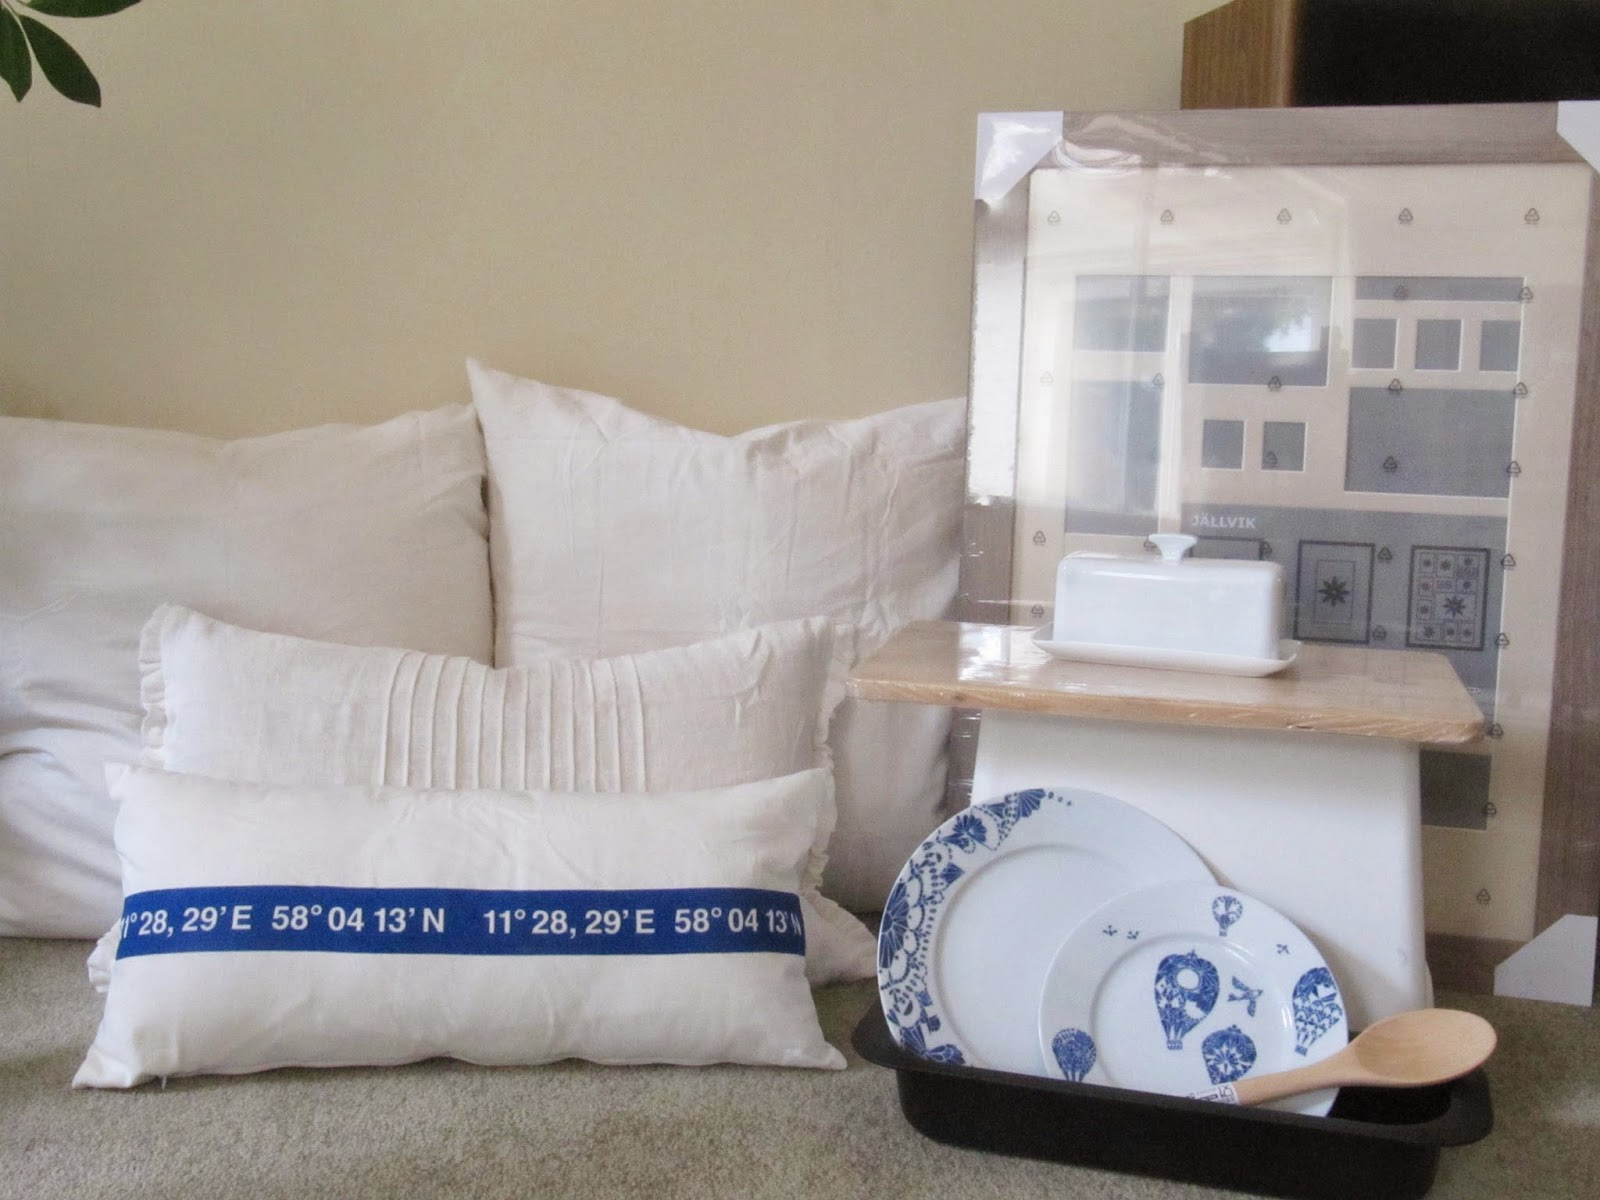 A trip to ikea bedroom progress and a pug party the for Euro shams ikea